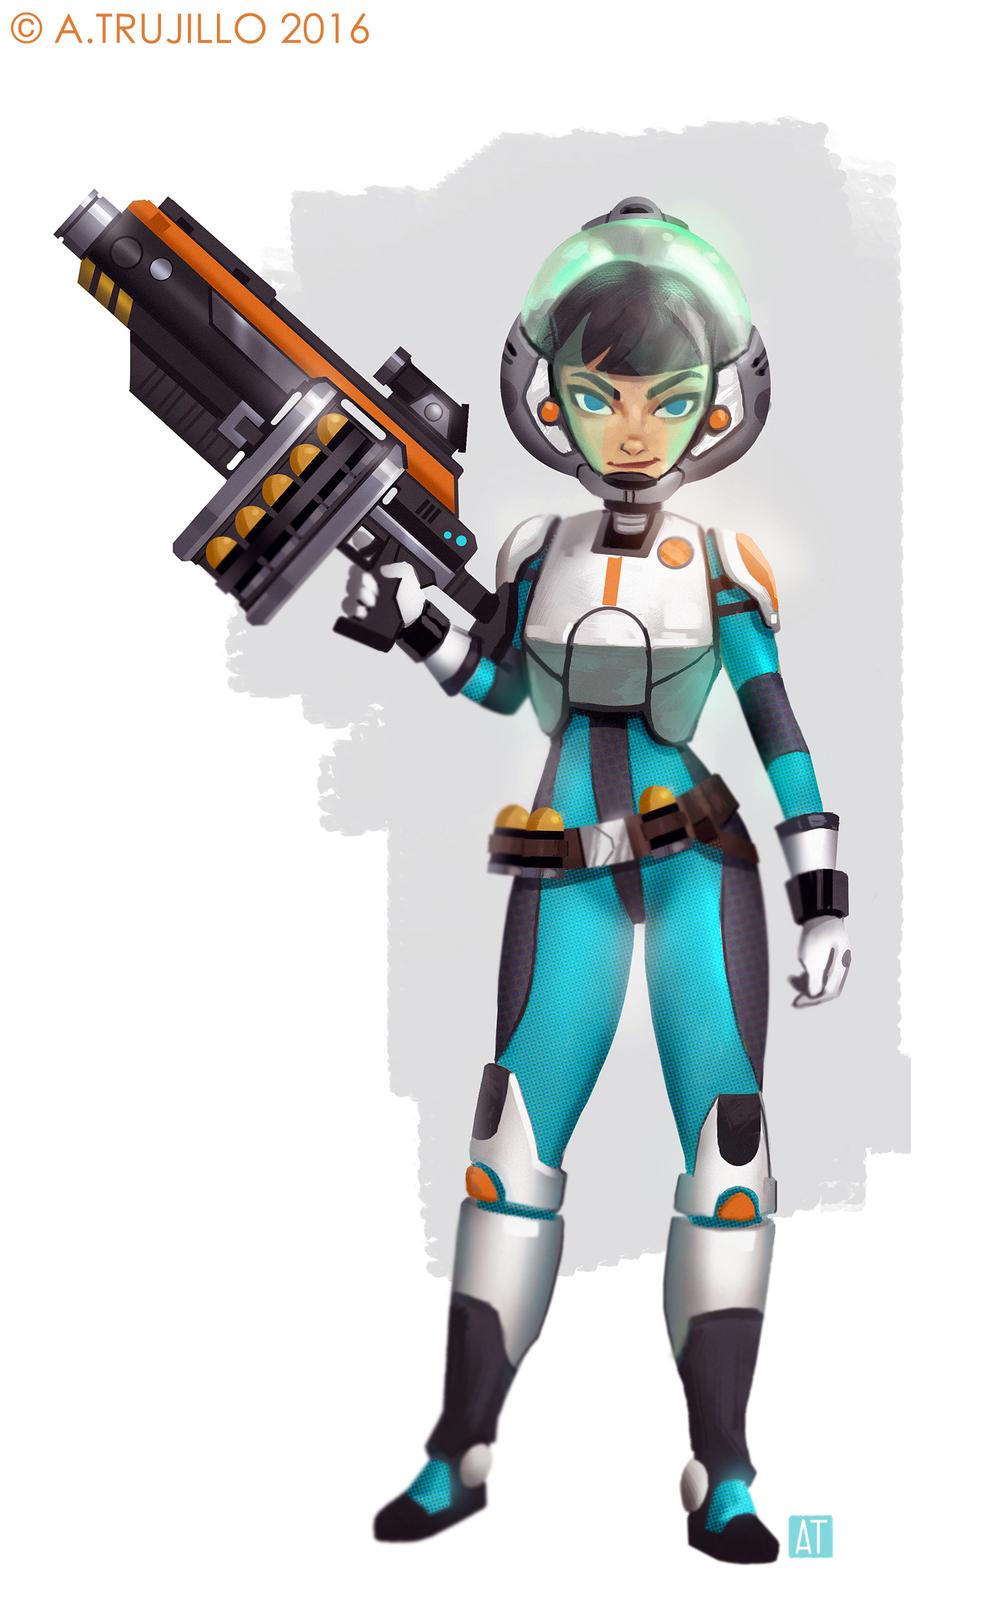 spacegirl_01.jpg